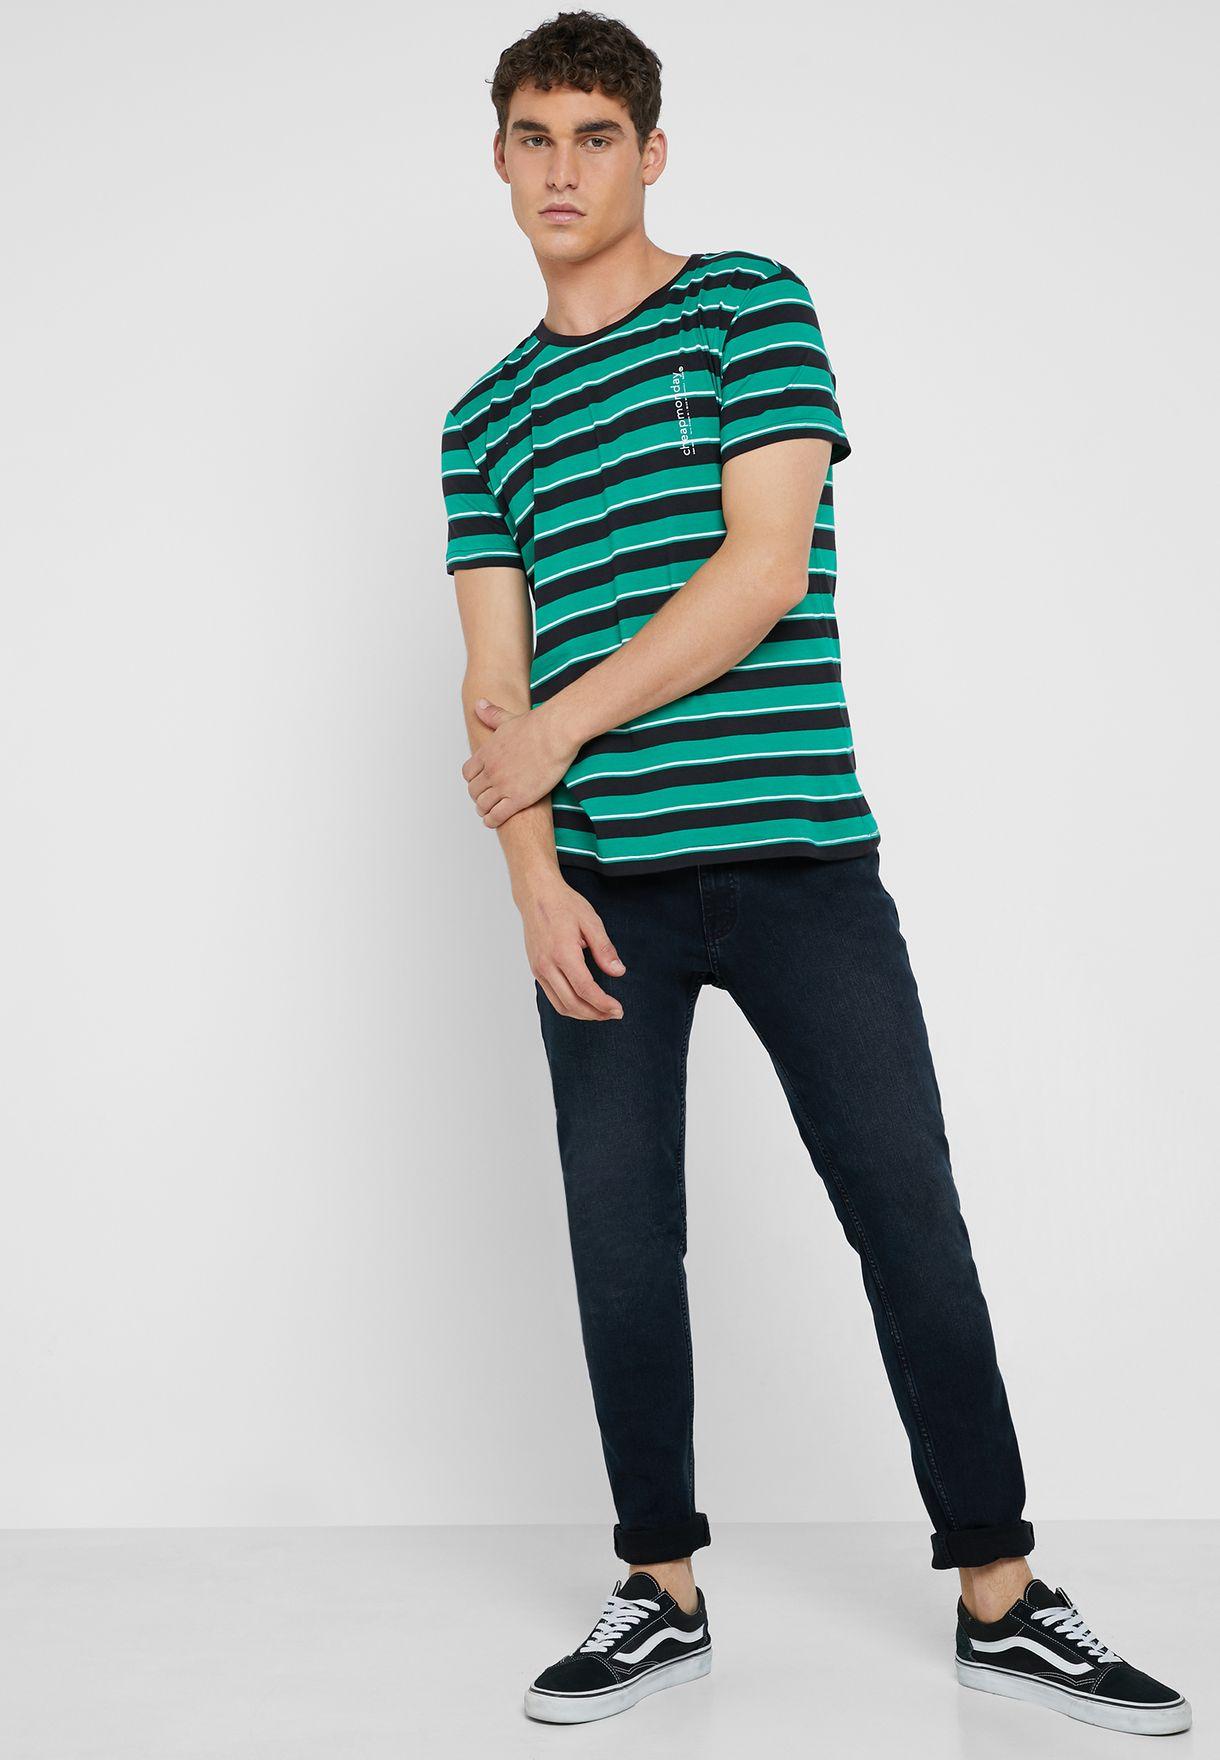 Super Skinny Fit jeans